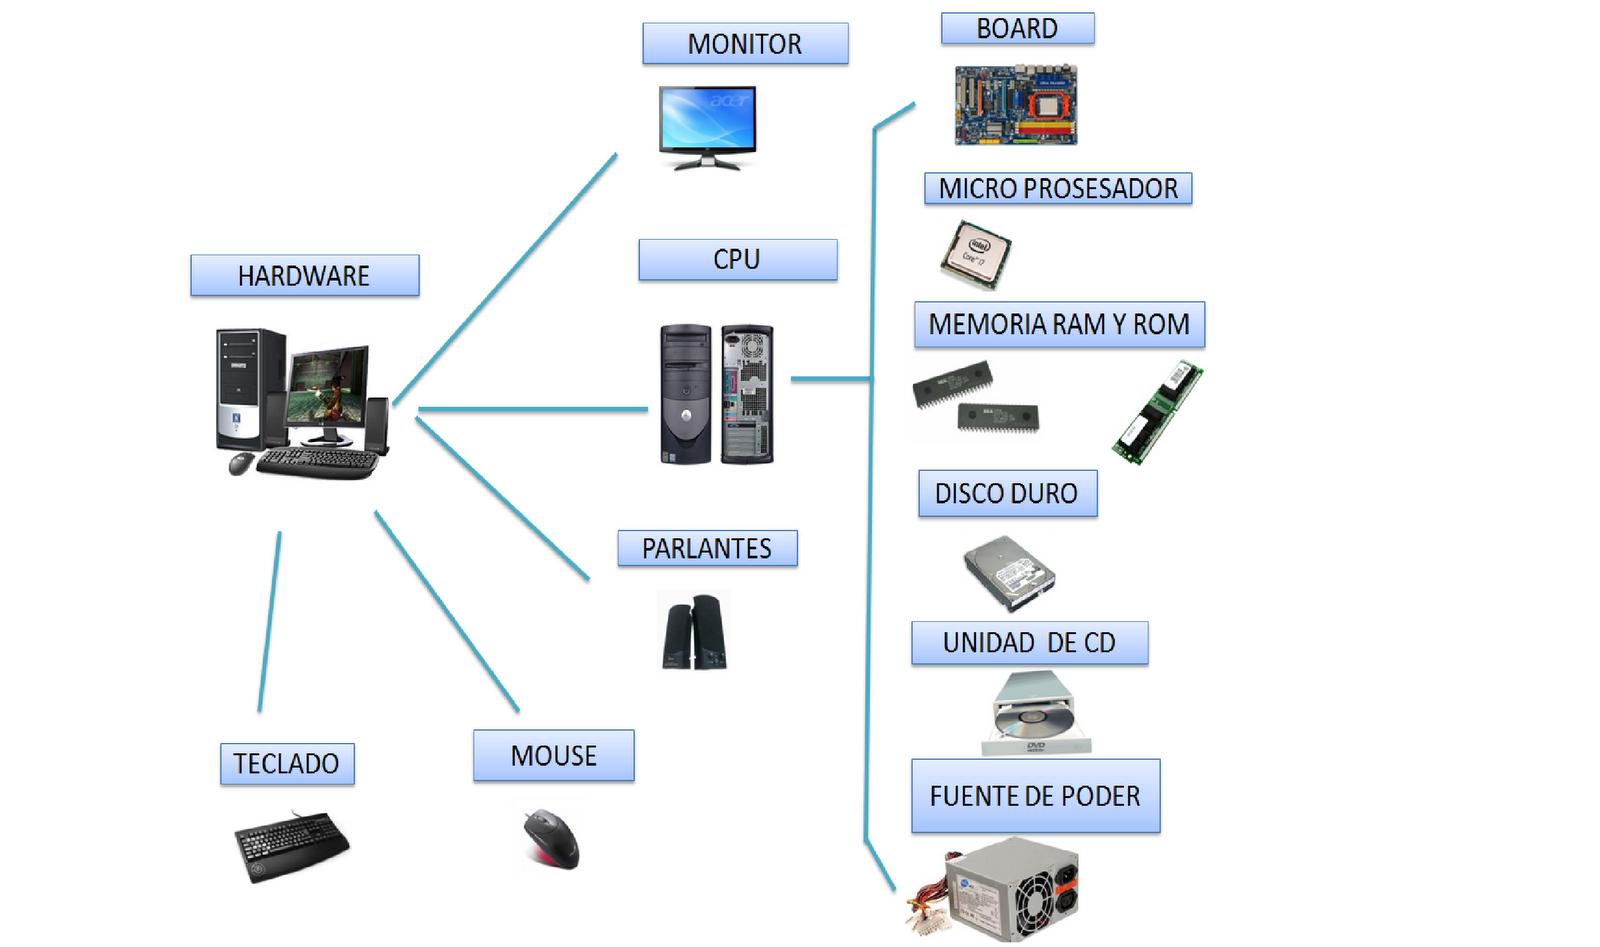 Partes de hardware agosto 2012 for Elementos de hardware